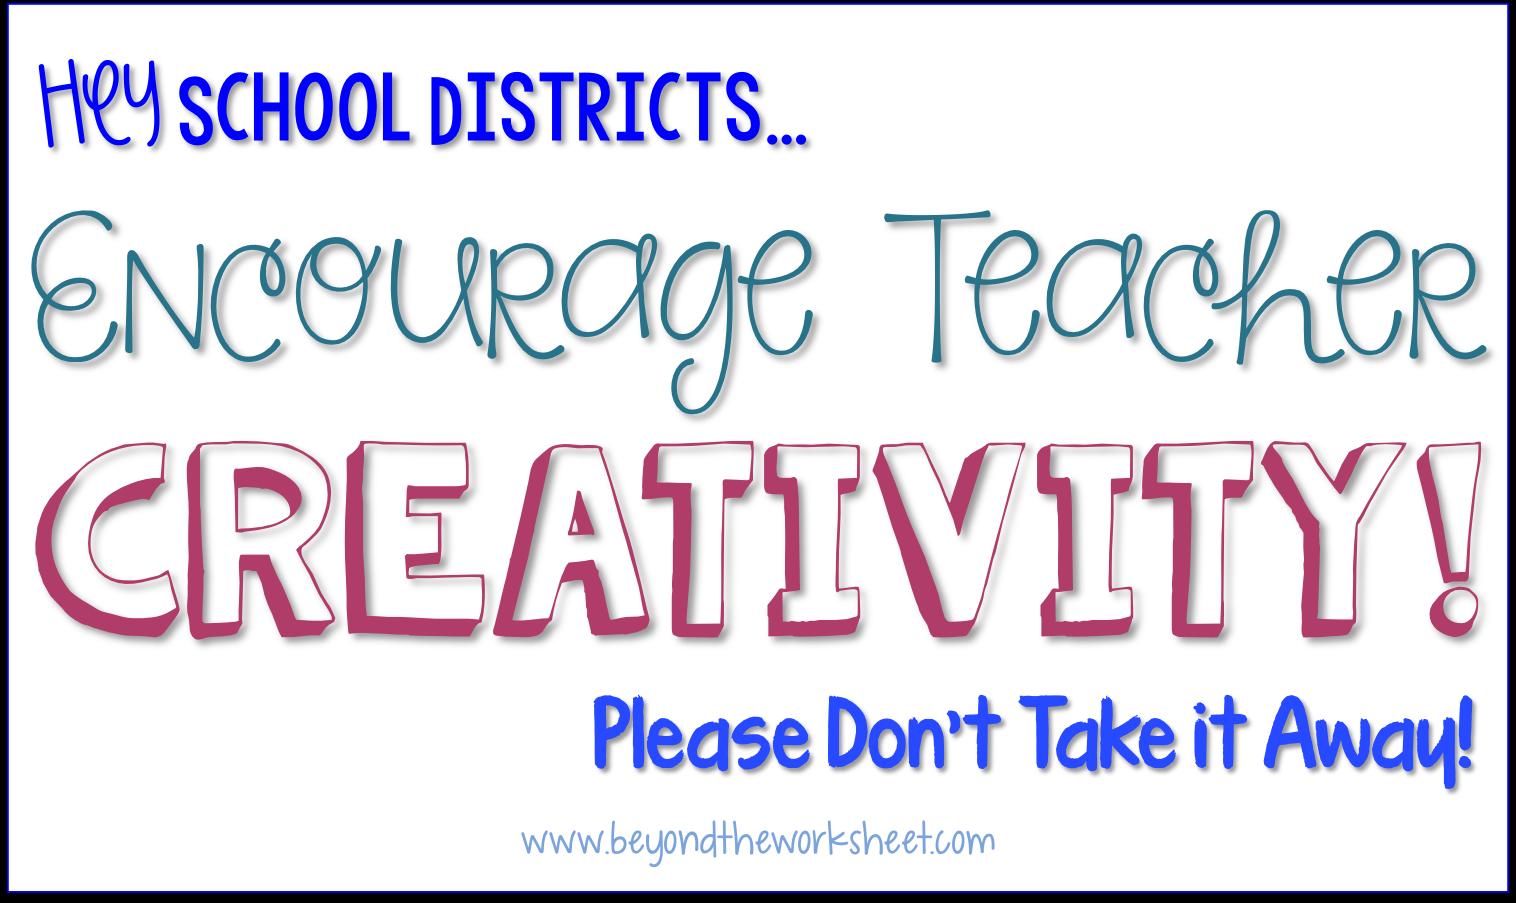 Encourage Creativity–Don't Take it Away!